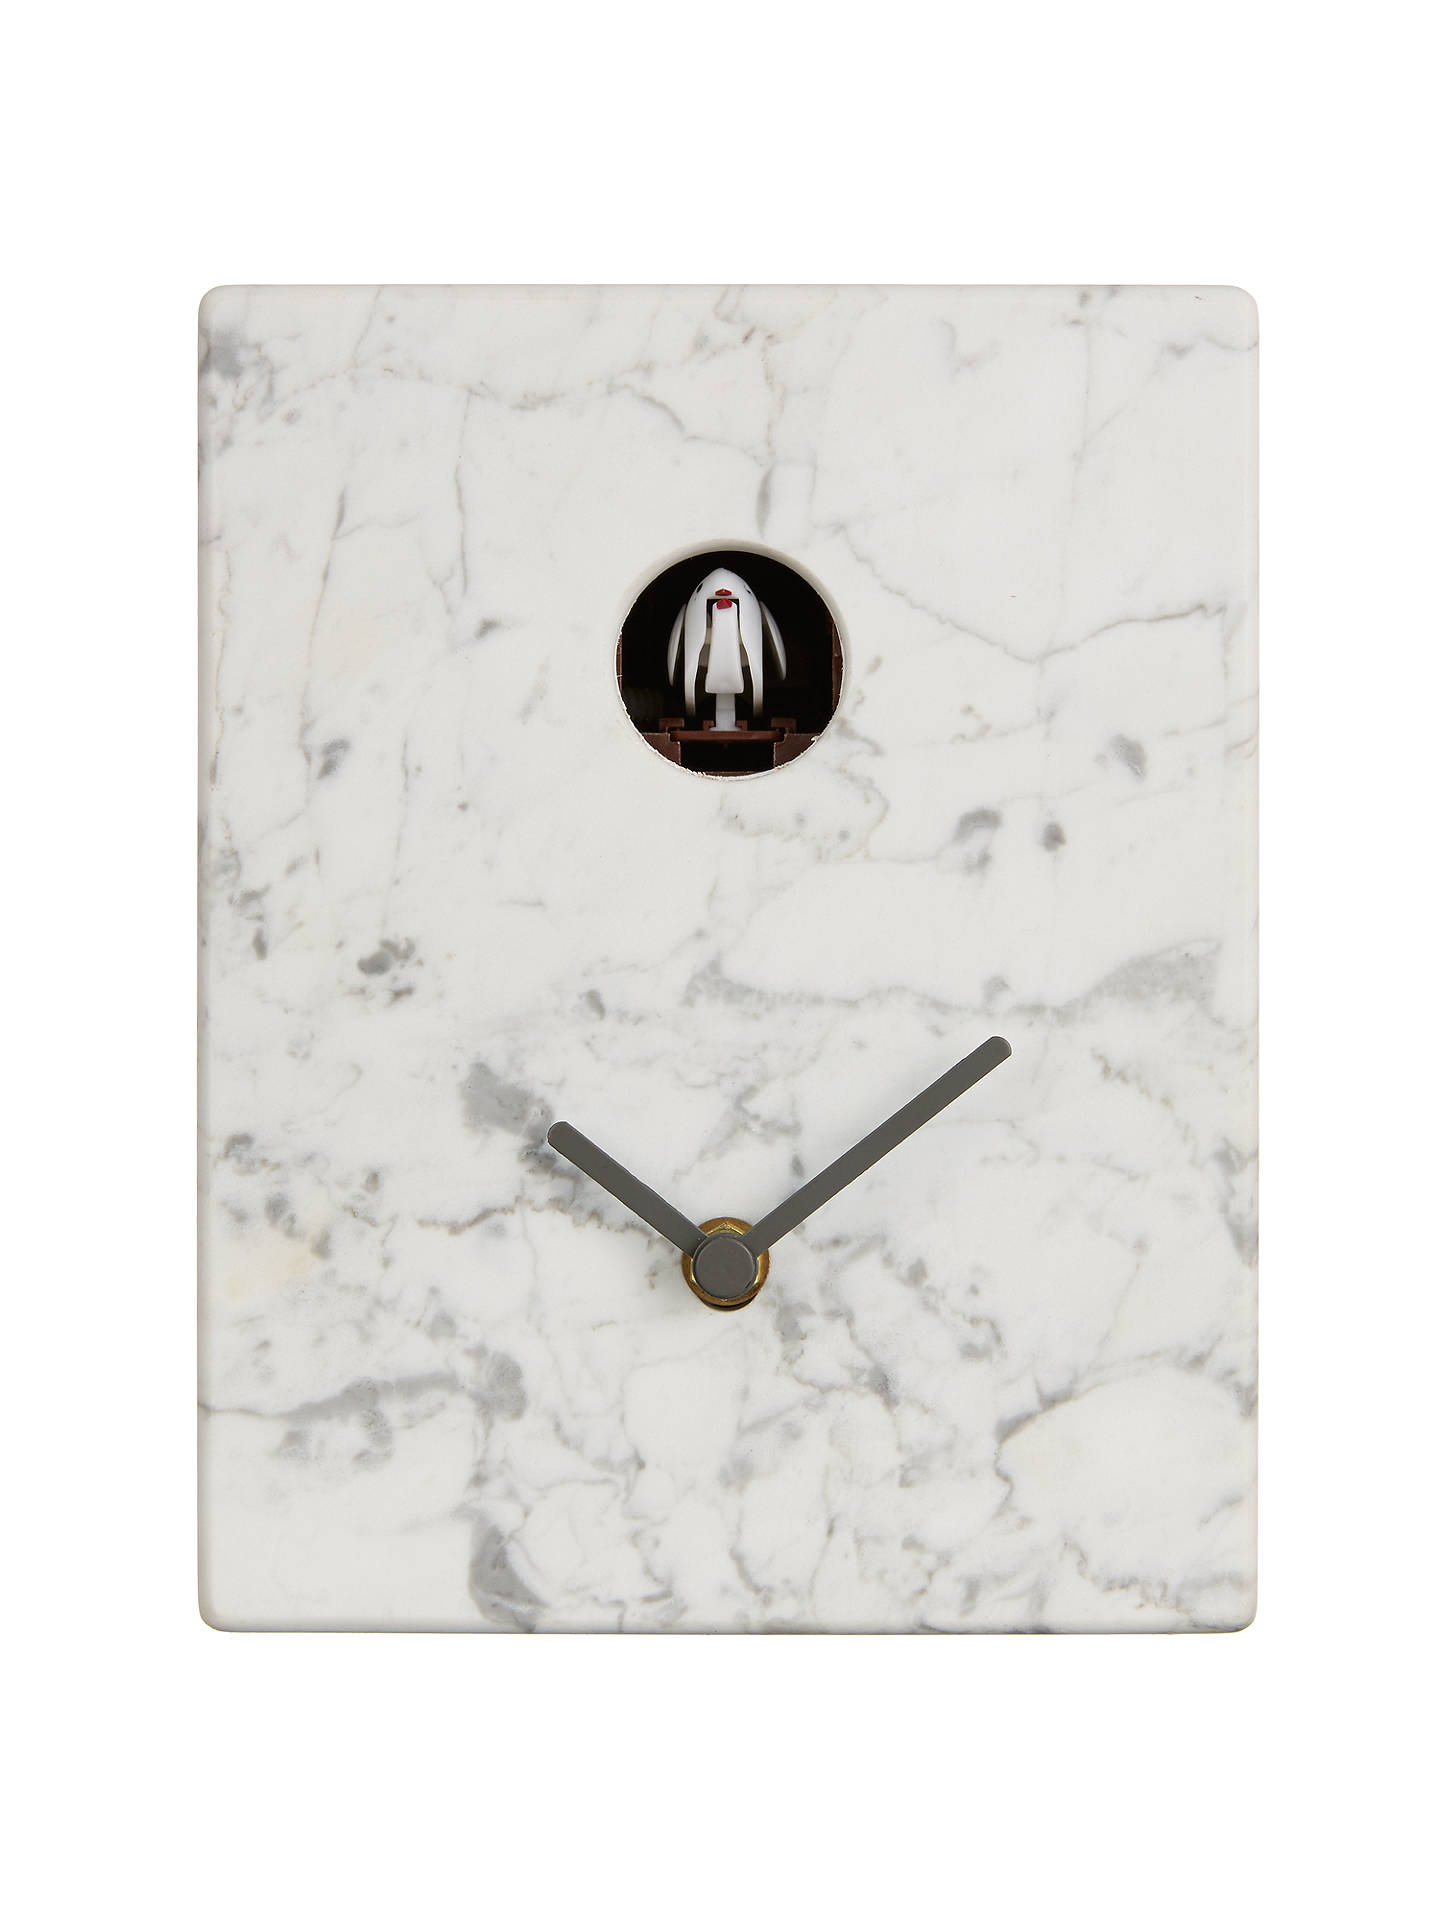 diamantini & domeniconi cuckoo clock instructions